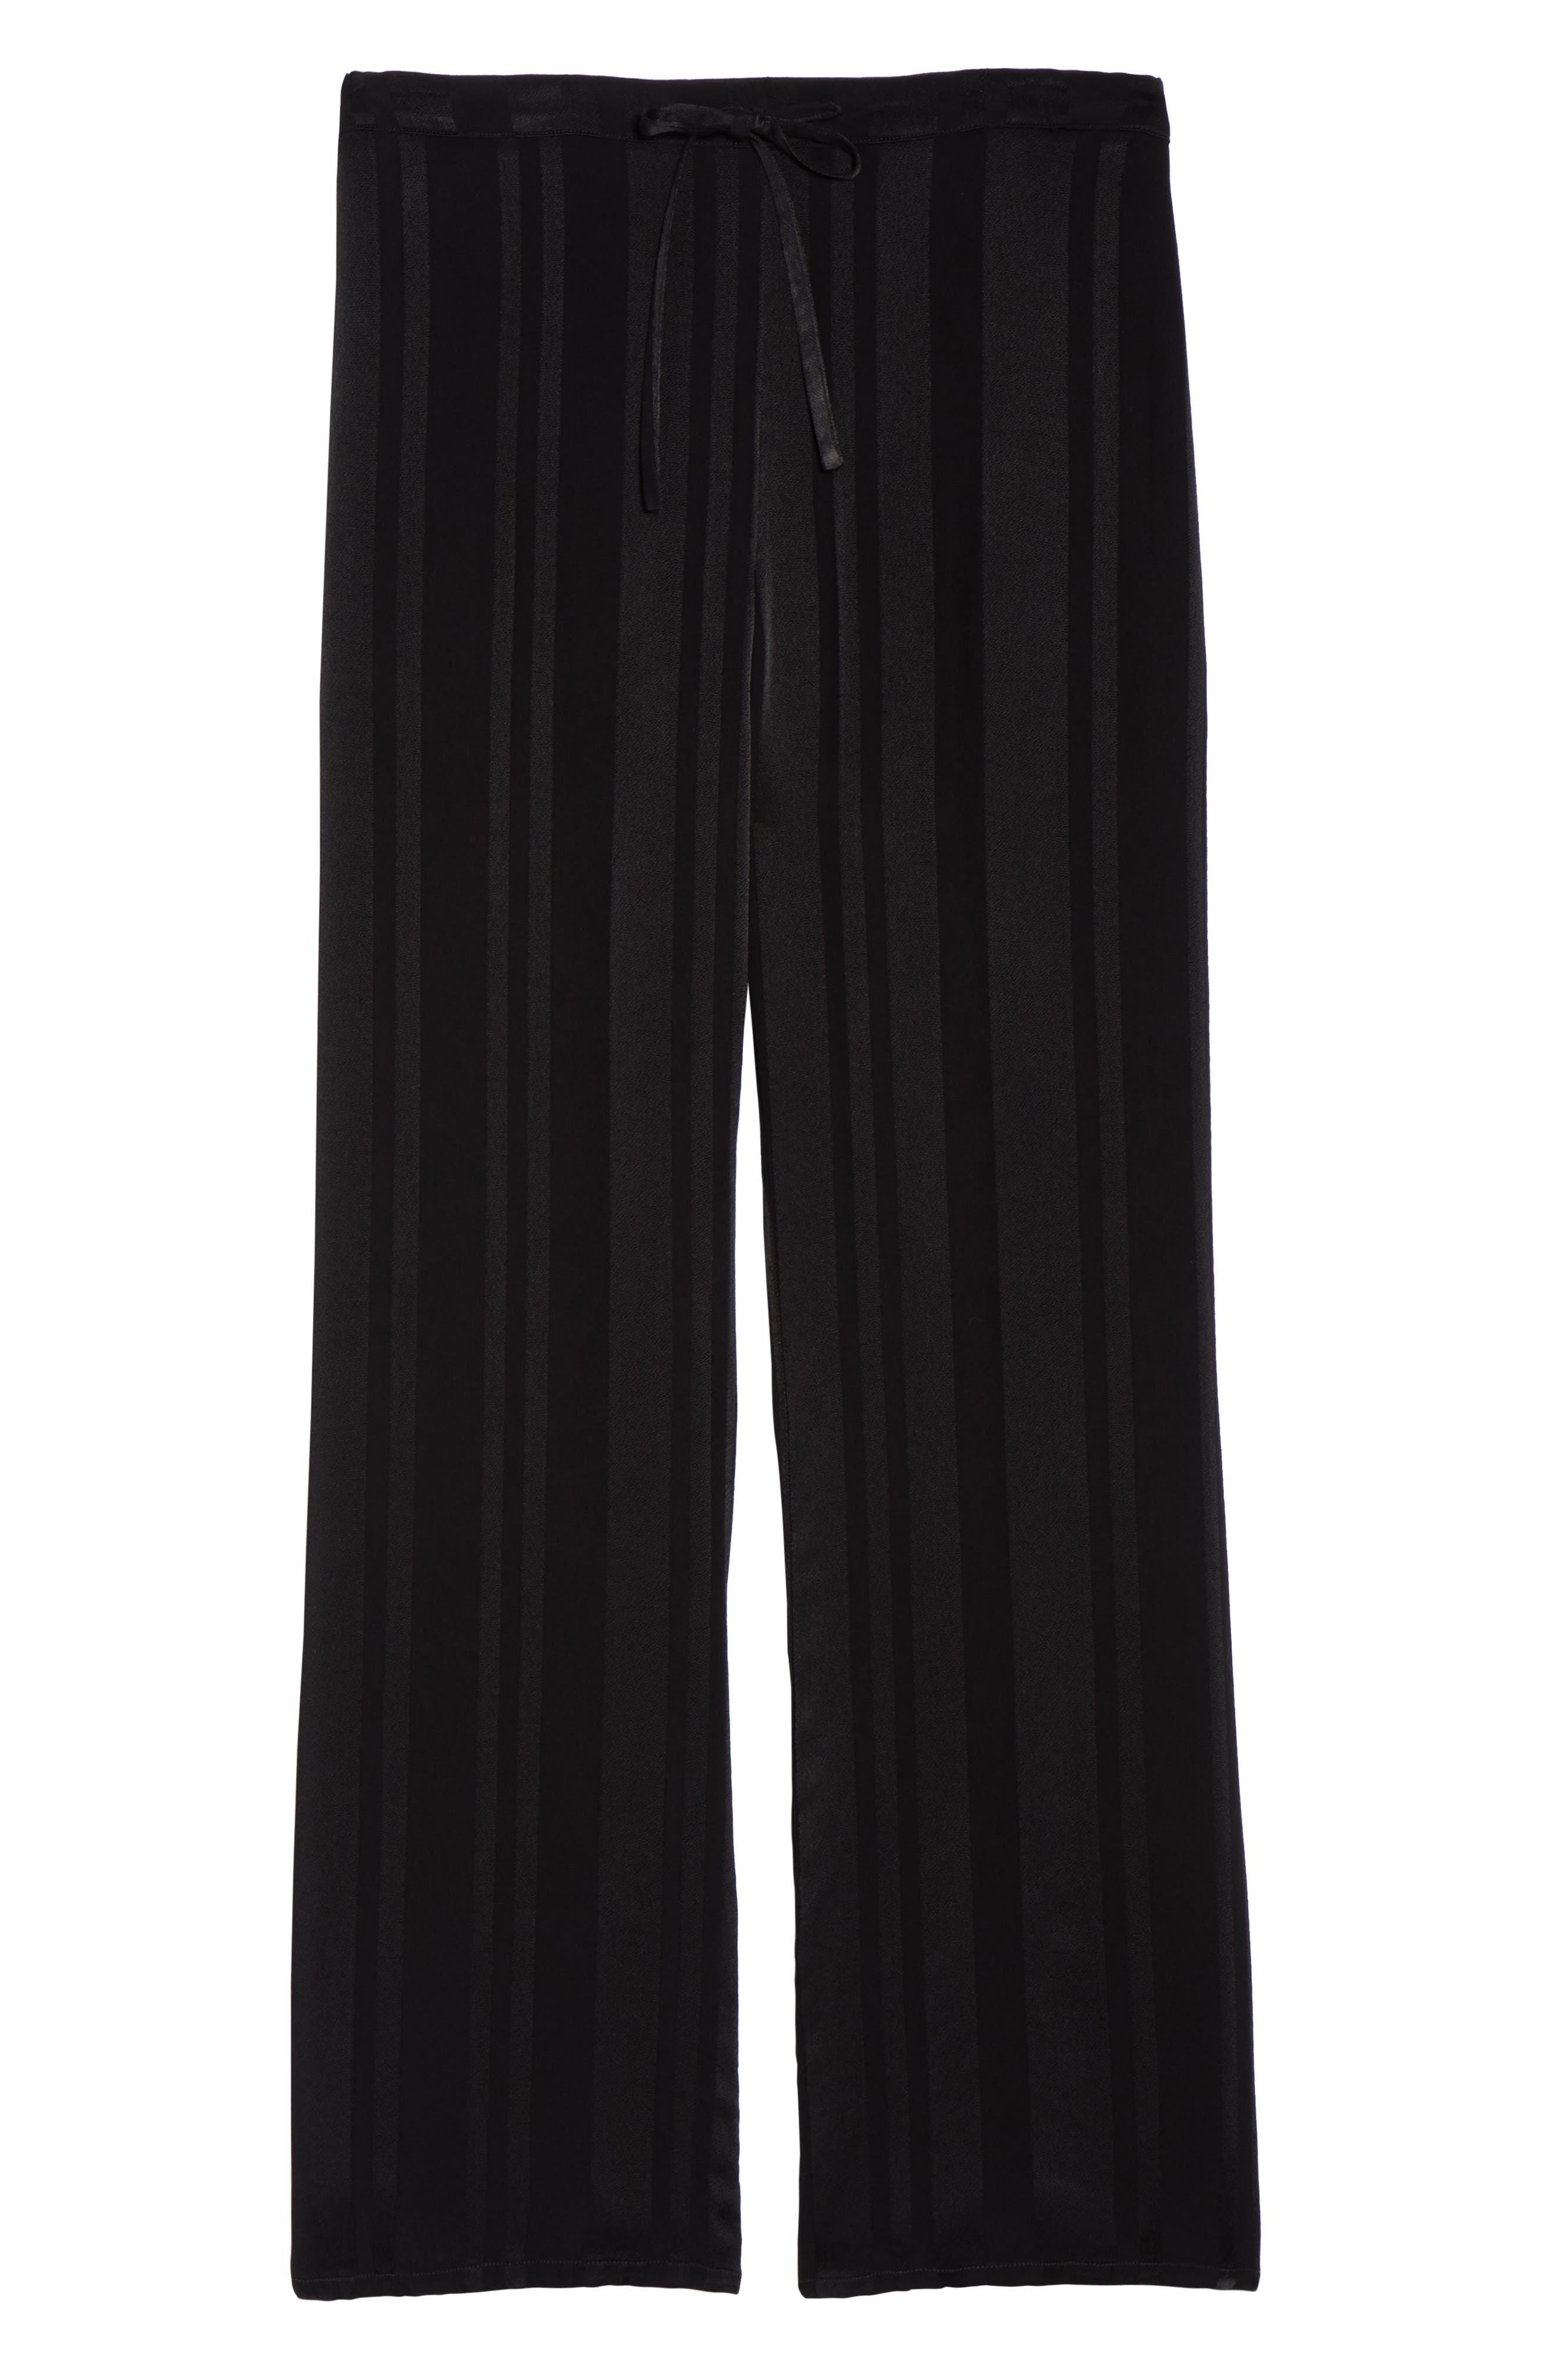 Vela Stripe Lounge Pants,                             Alternate thumbnail 6, color,                             009